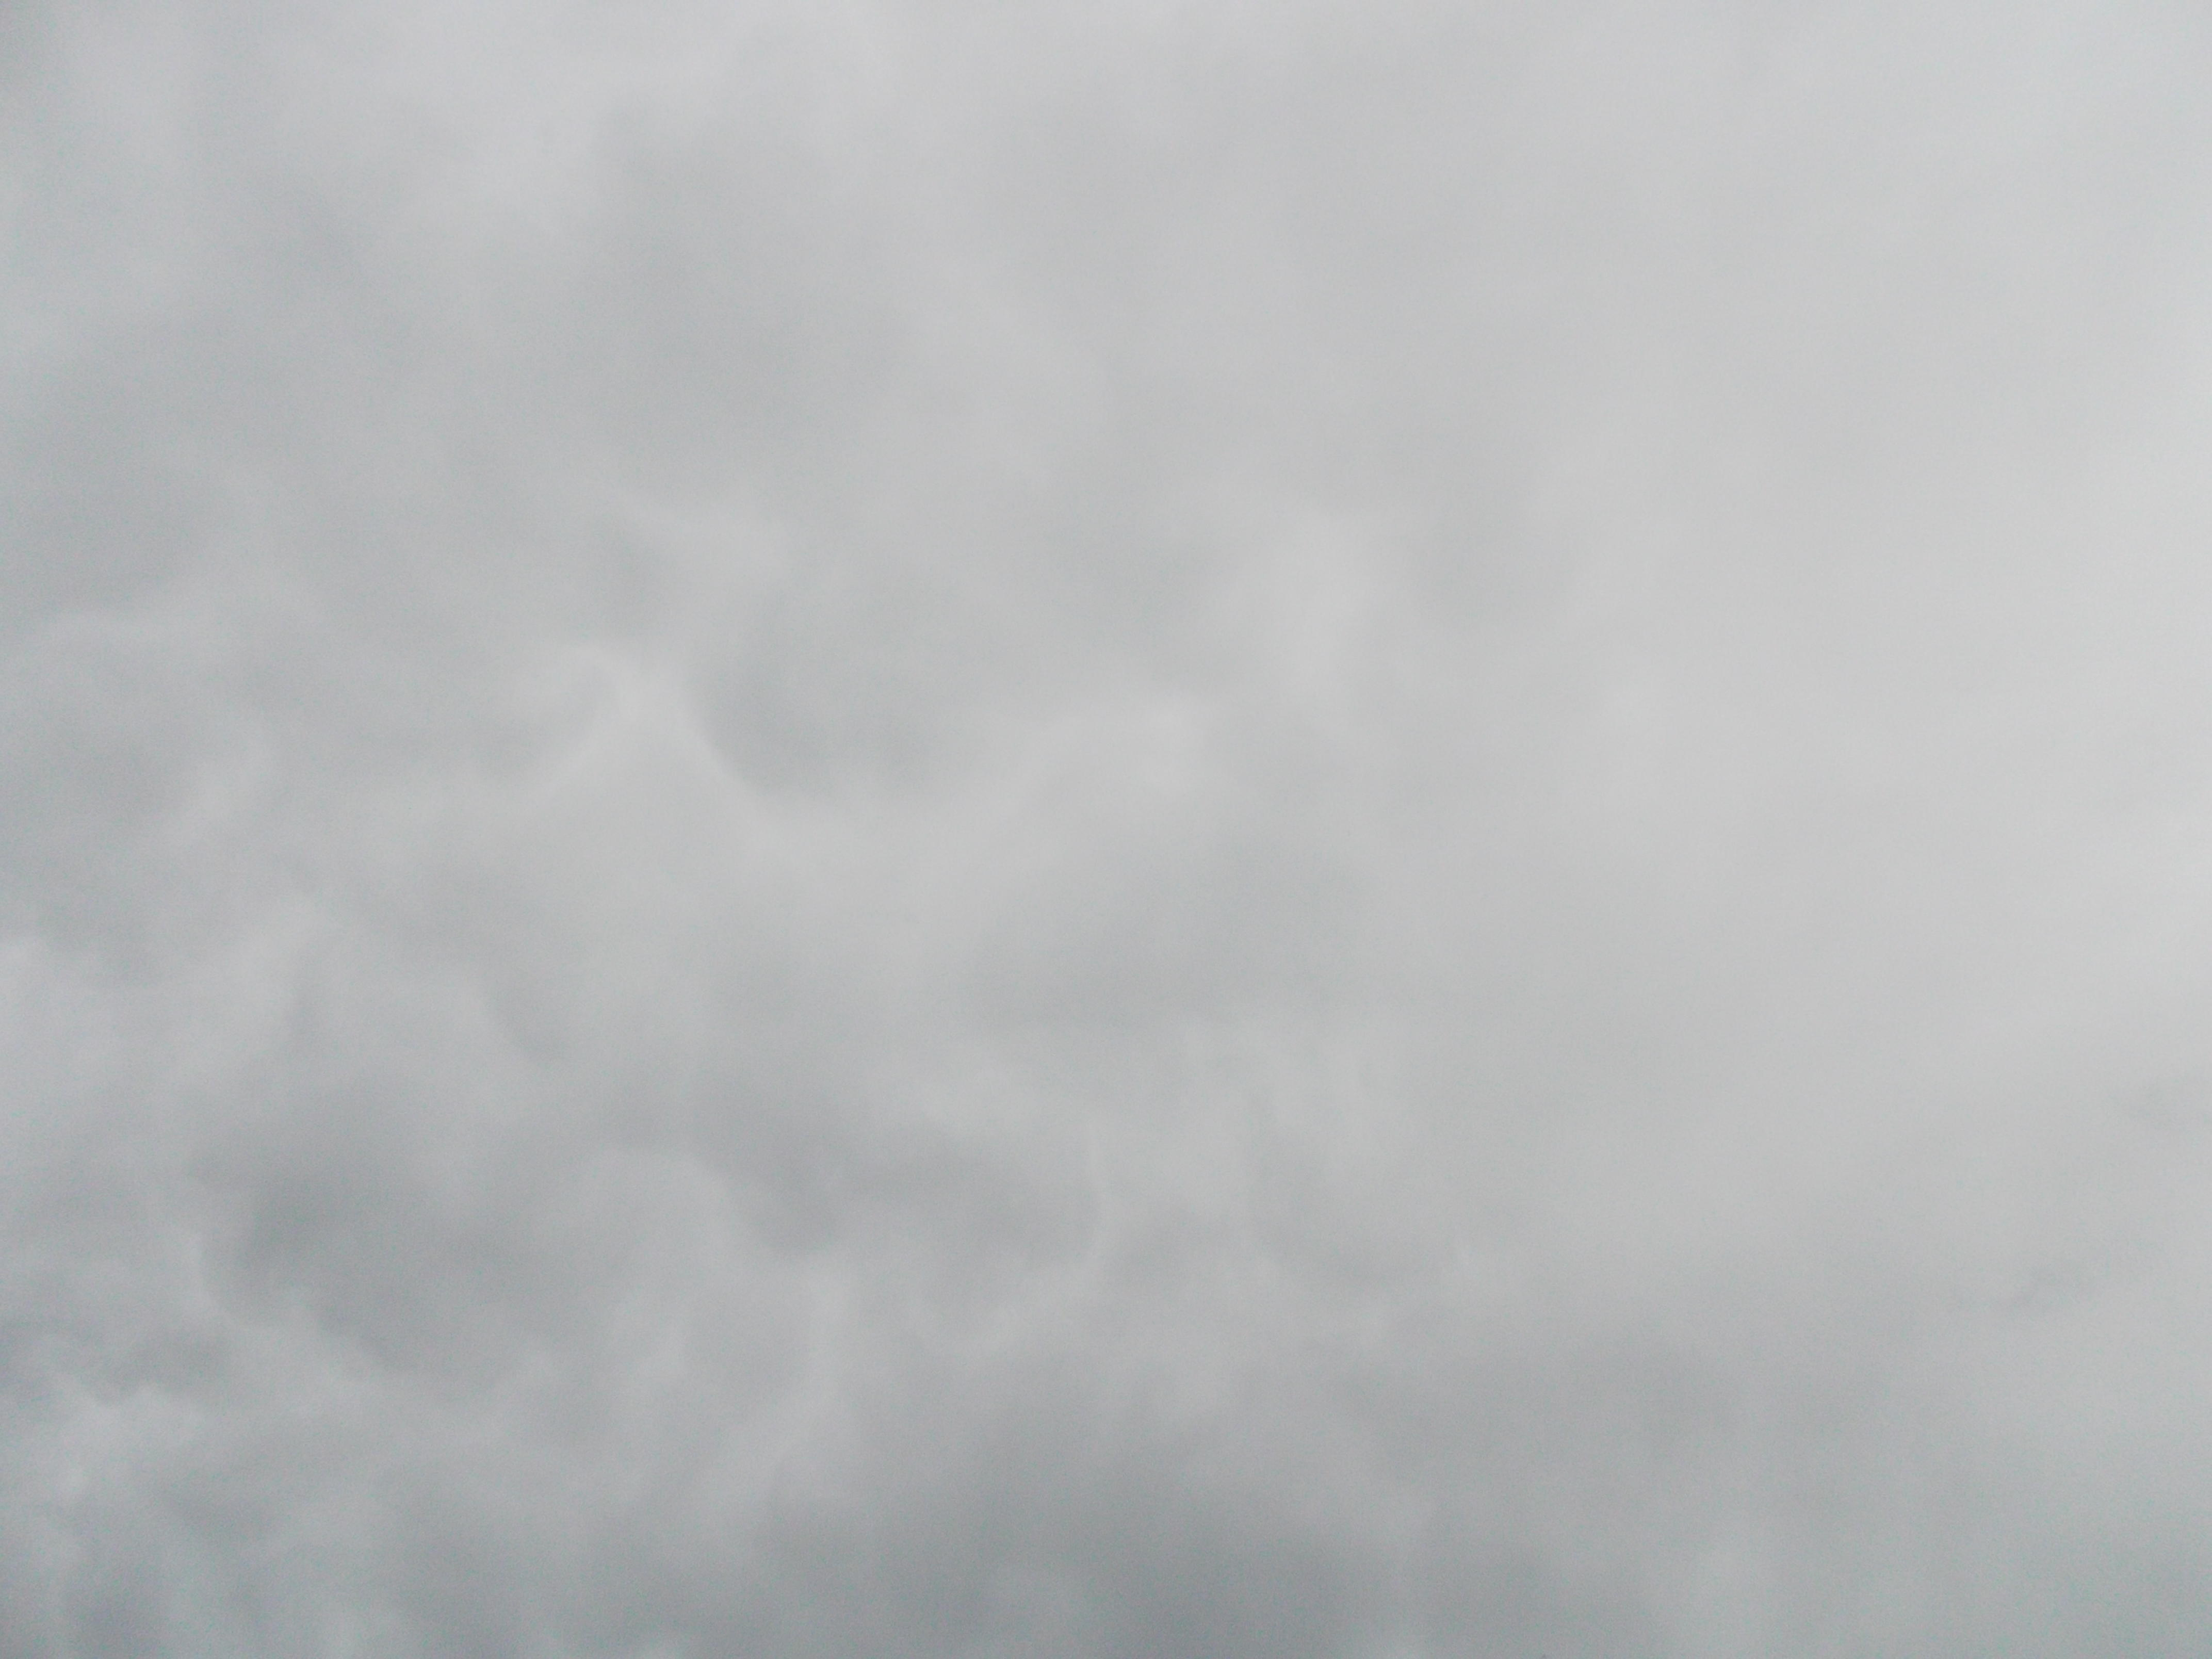 2013-03-22 Longitude -0.360578 Latitude 49.168919 Altitude 29 Heure 15h23